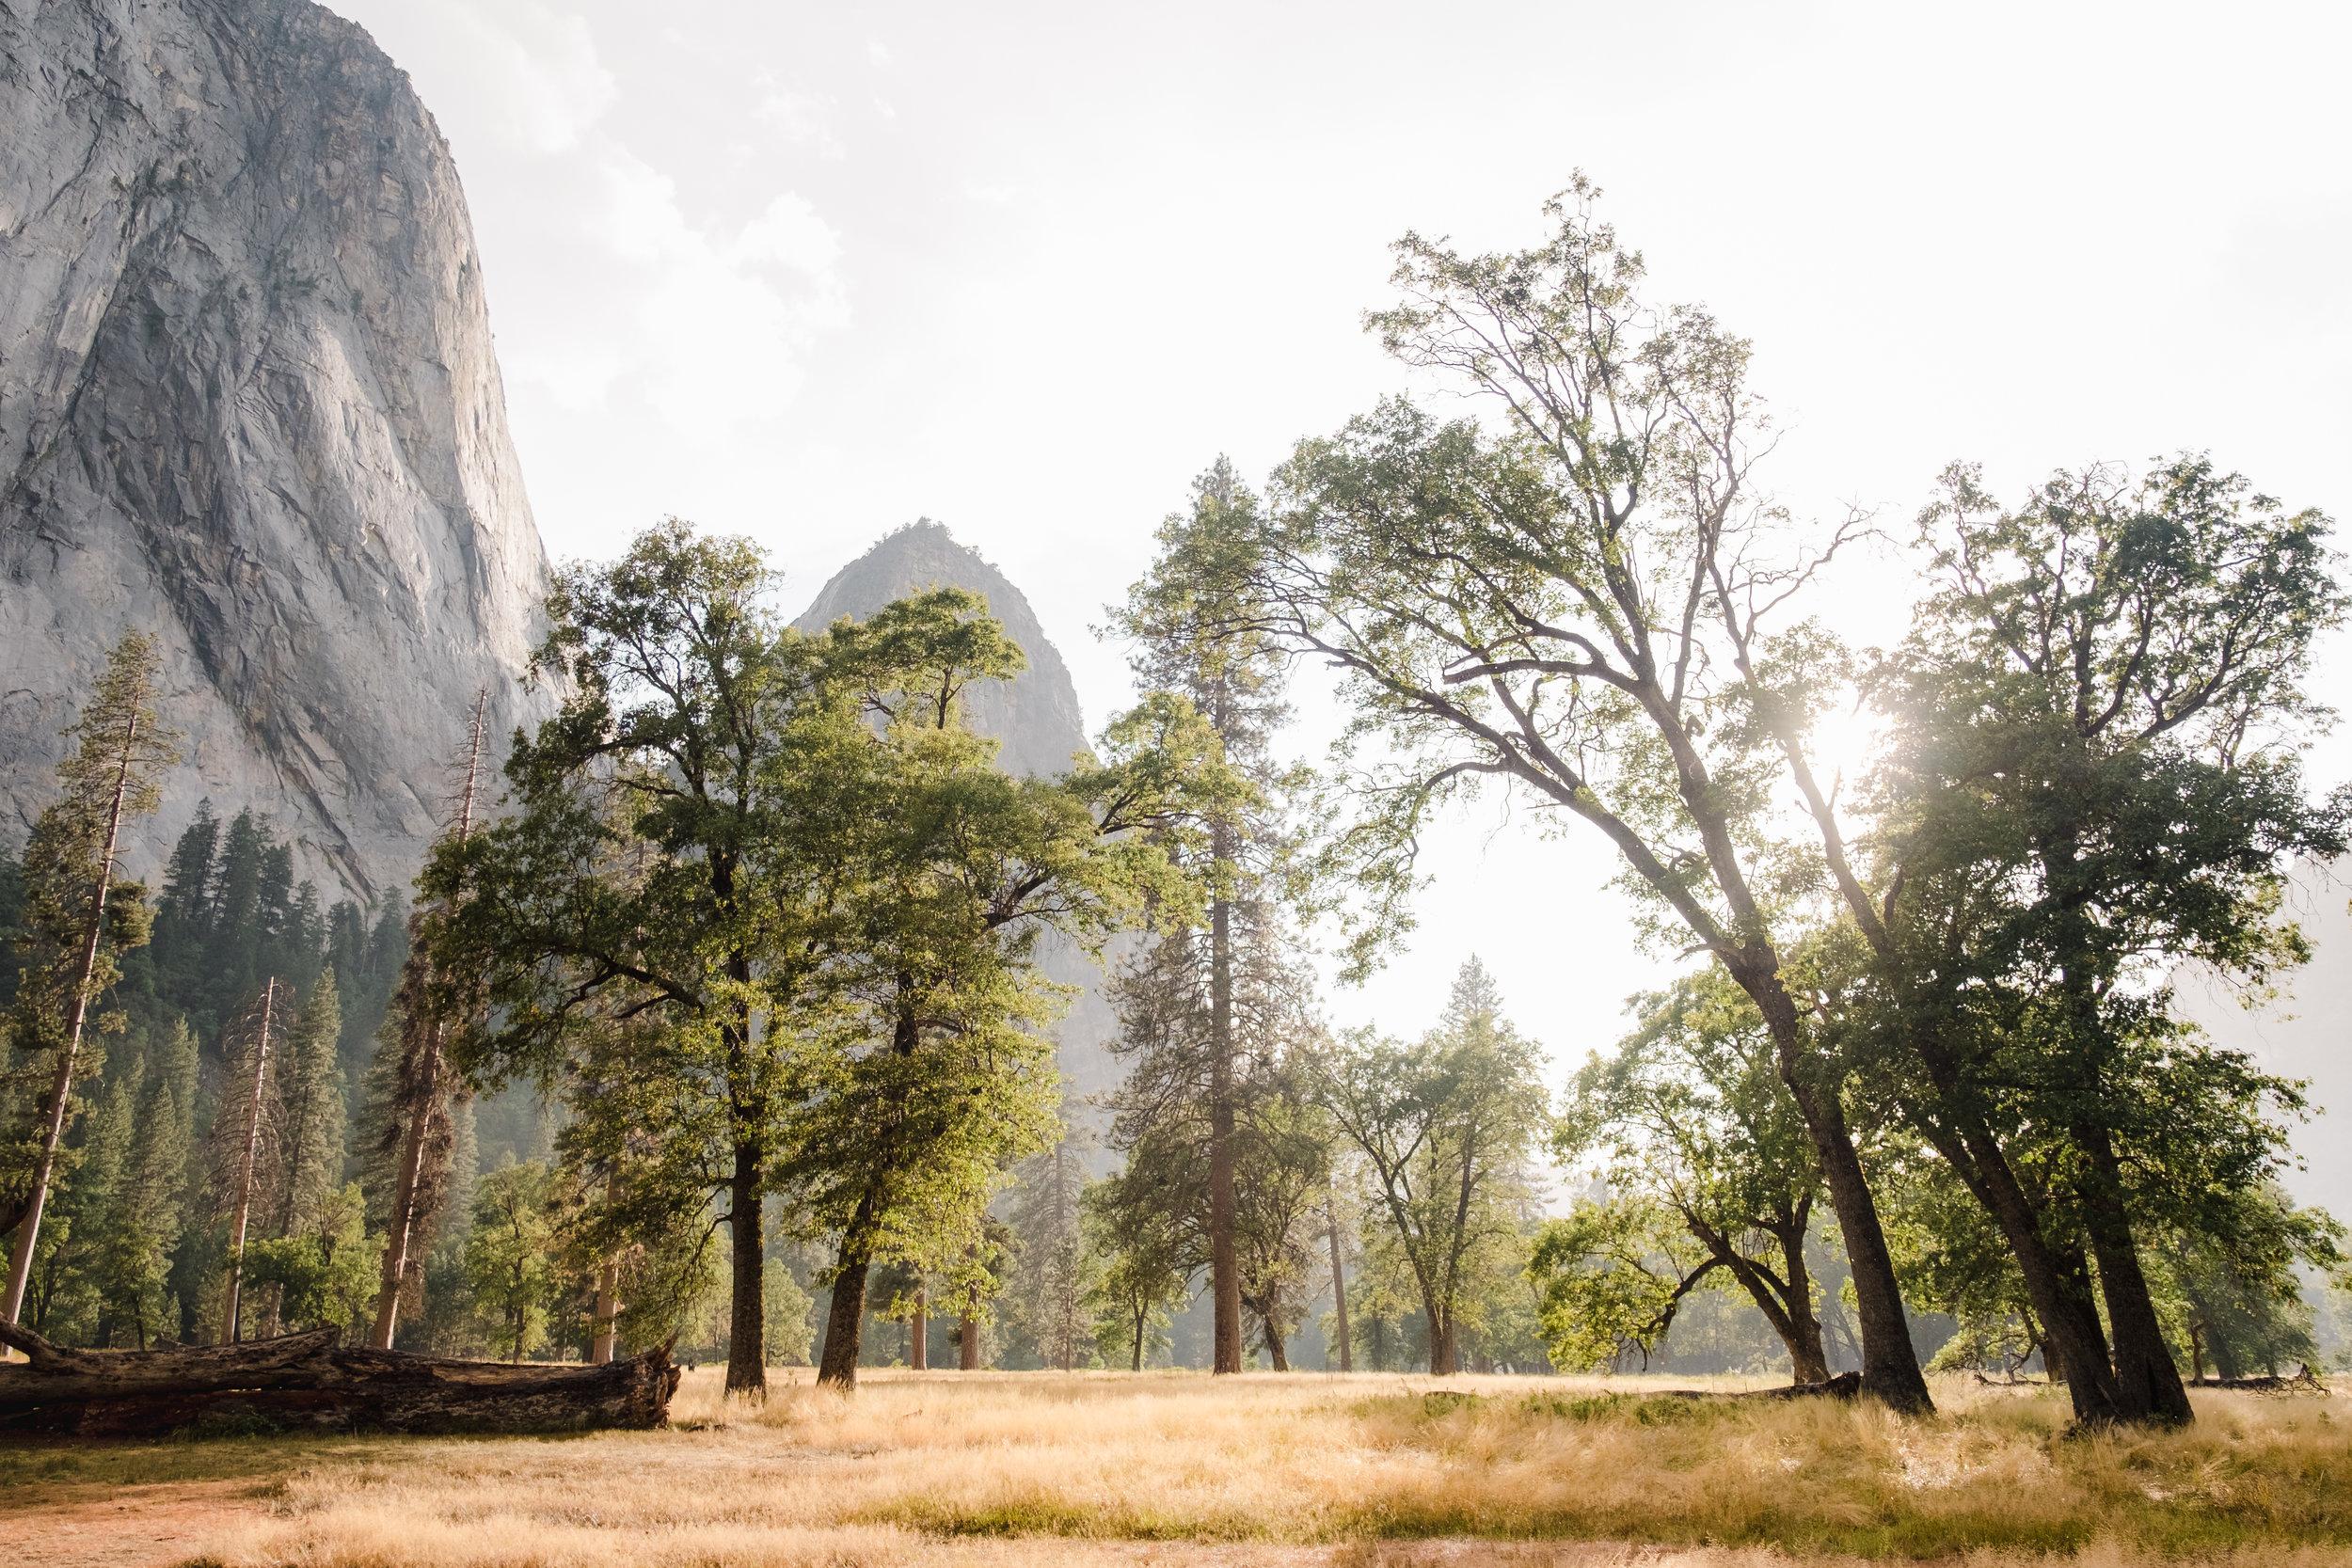 Yosemite_National_Park2.jpg